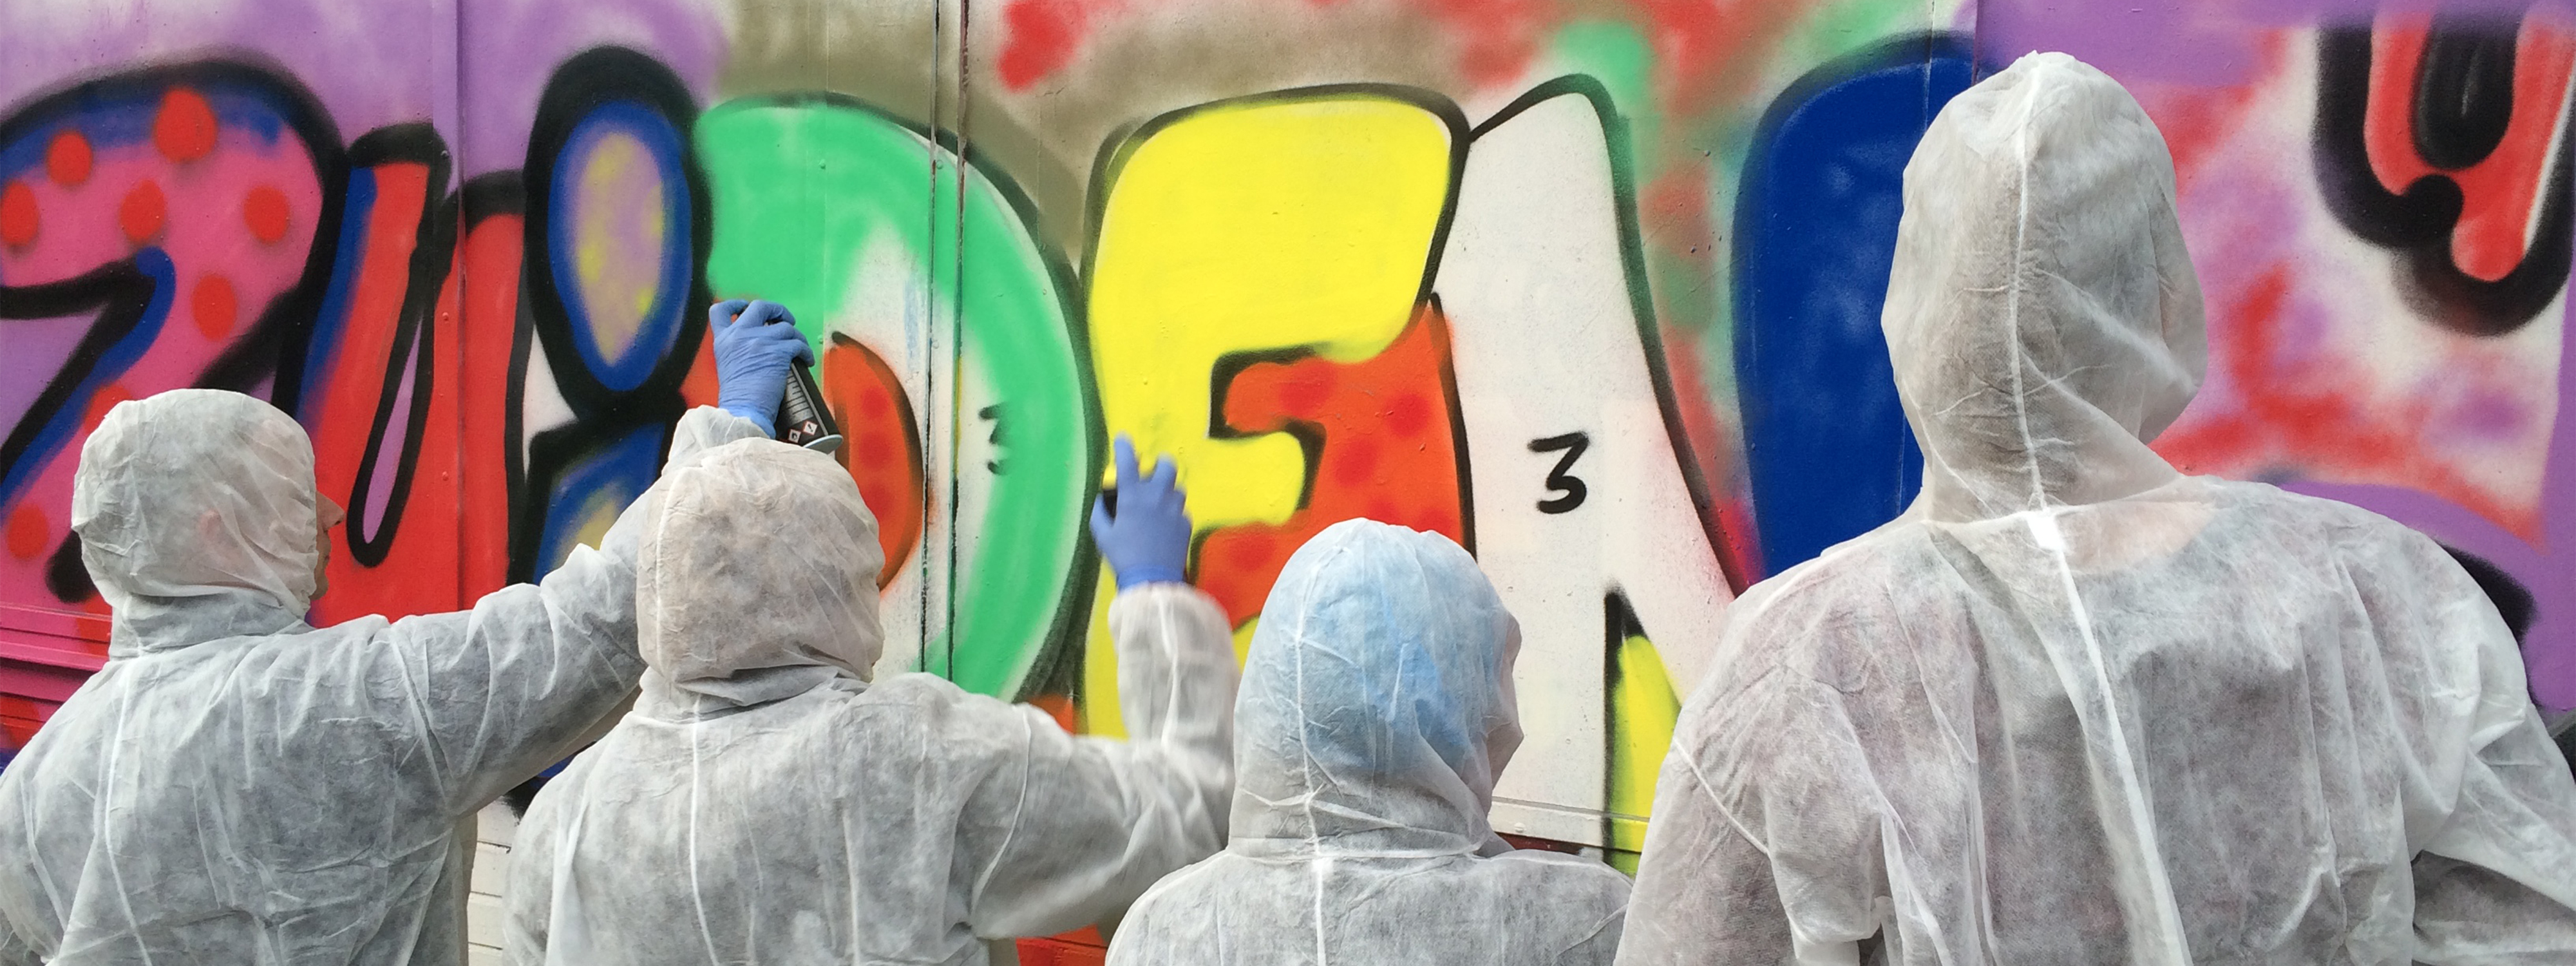 Crazy art tilburg/breda 1